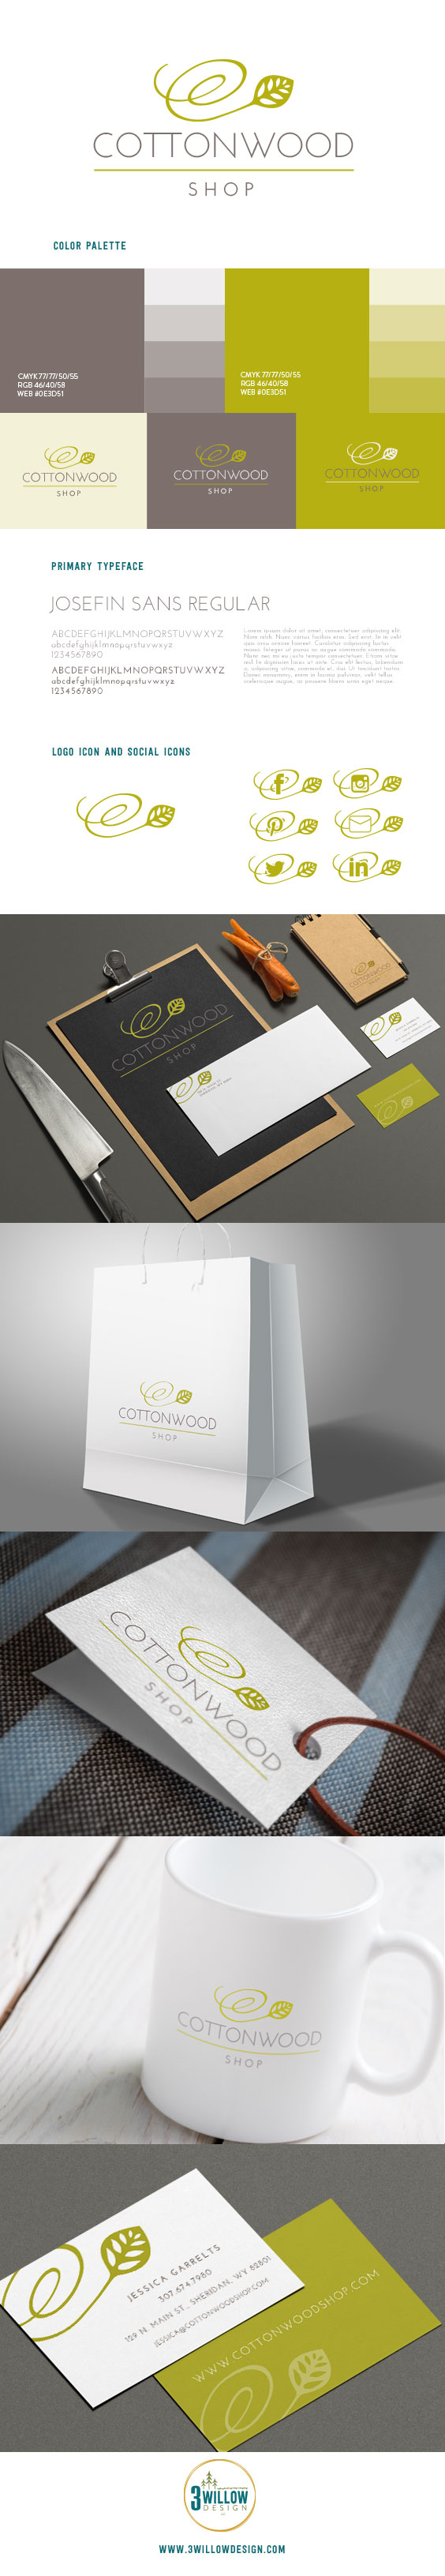 Cottonwood Shop Branding Board